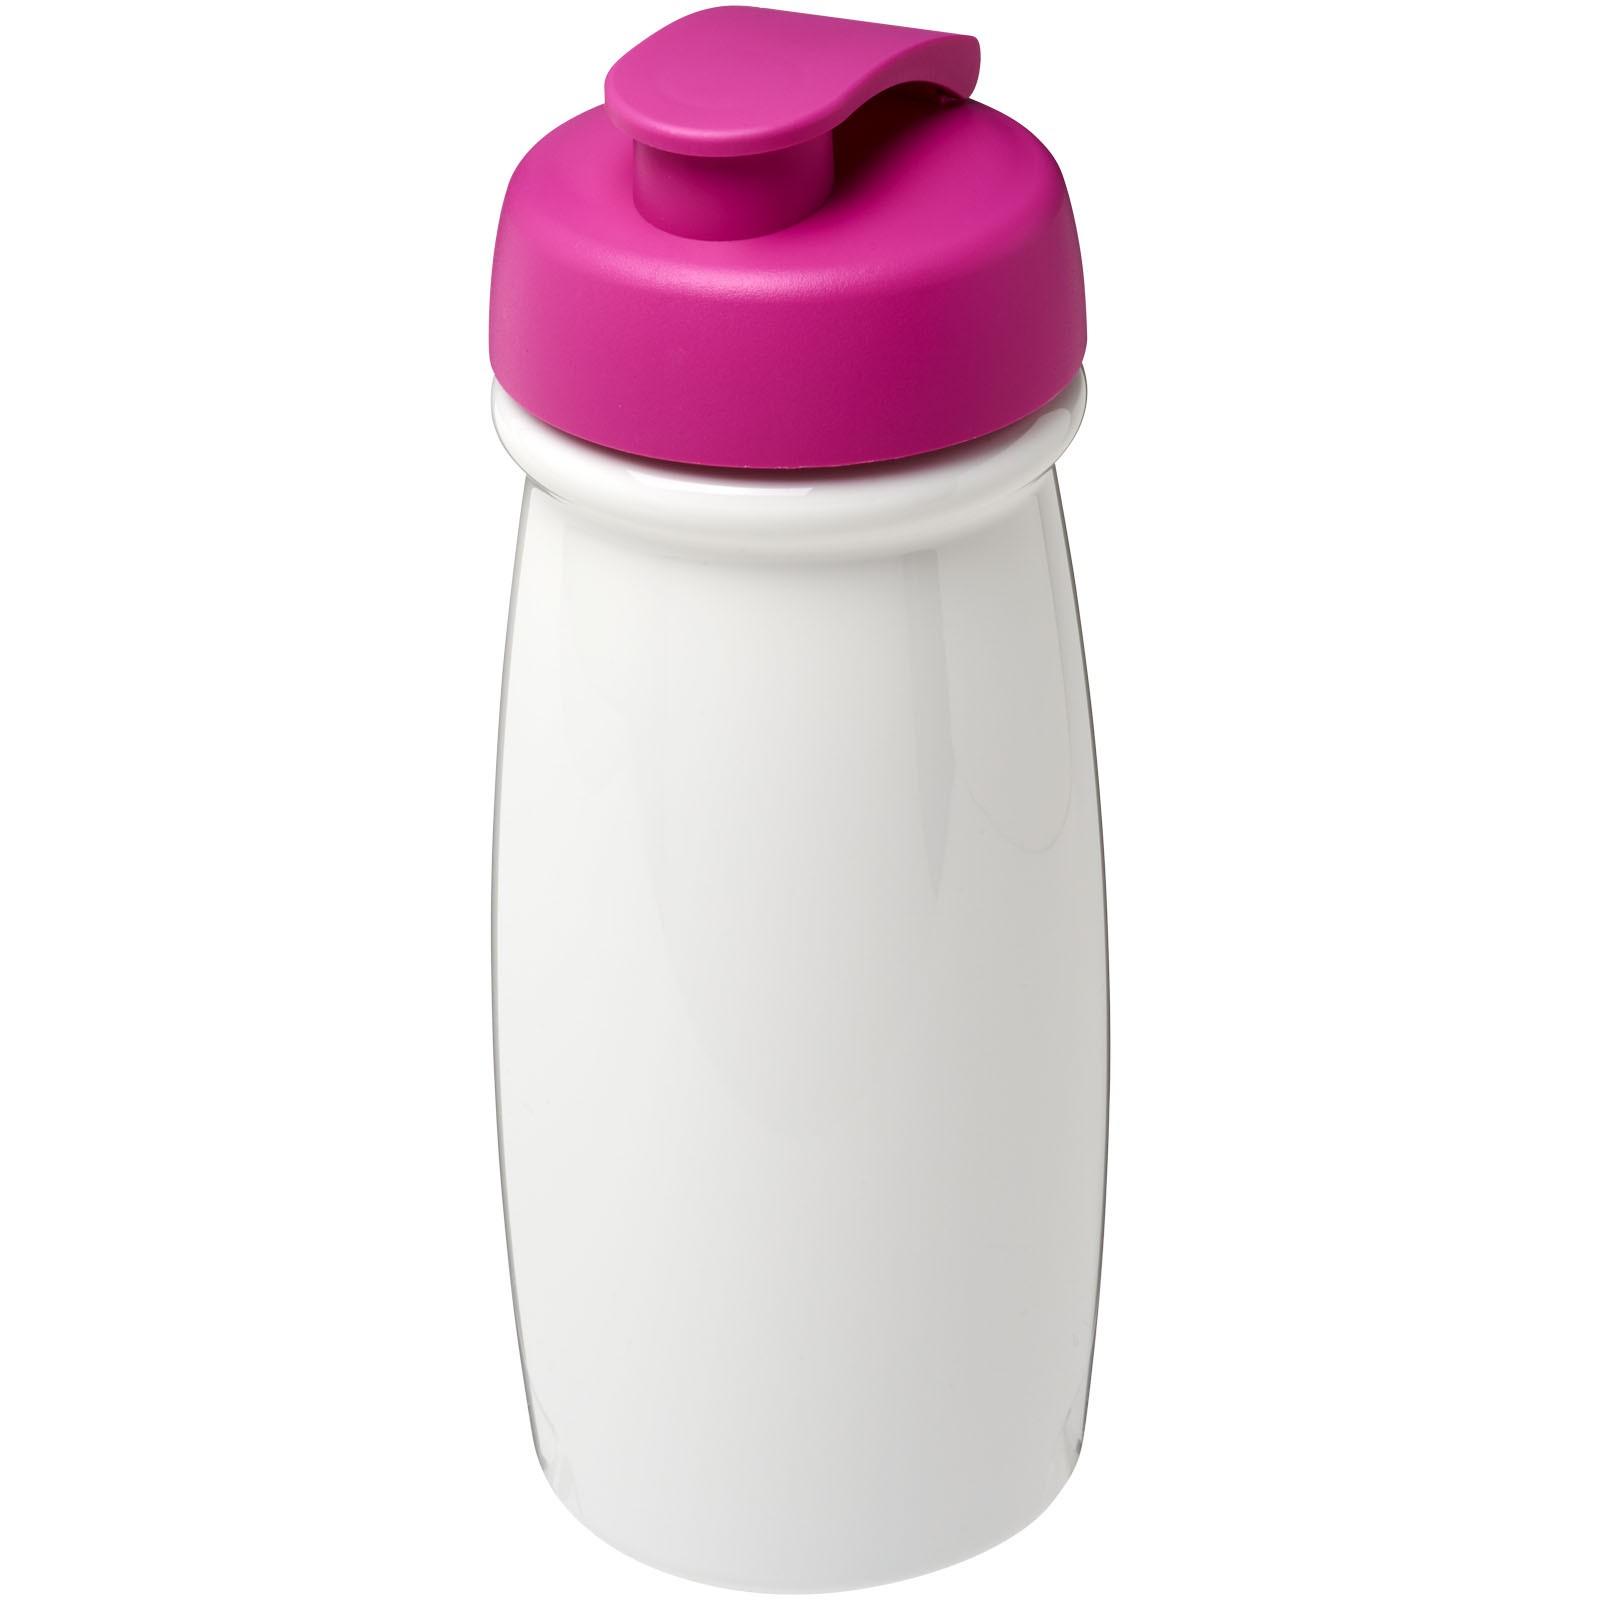 H2O Pulse® 600 ml flip lid sport bottle - White / Pink